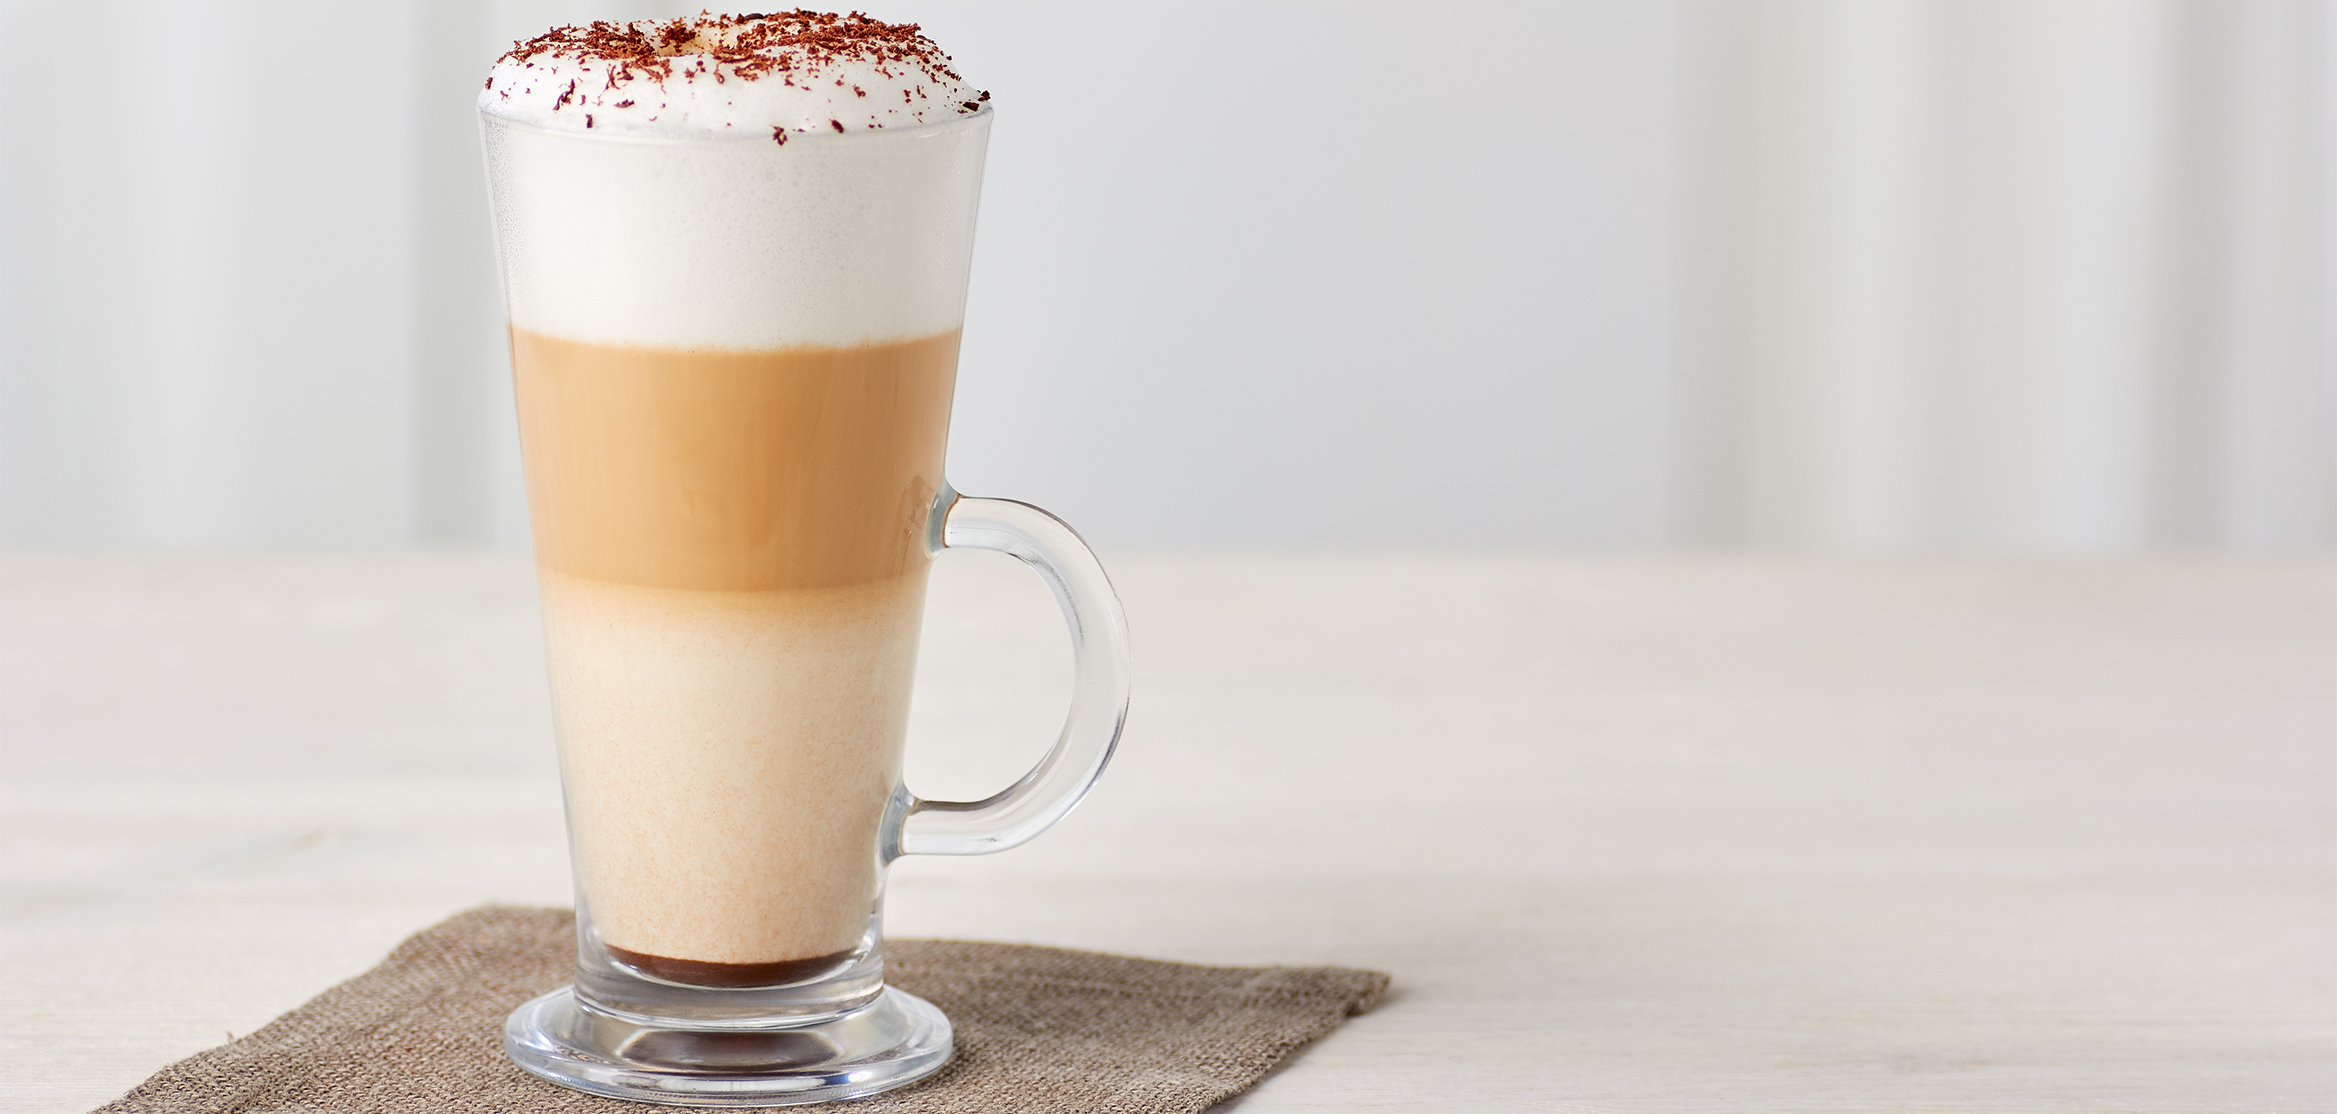 Pot Stirrer for Coffee